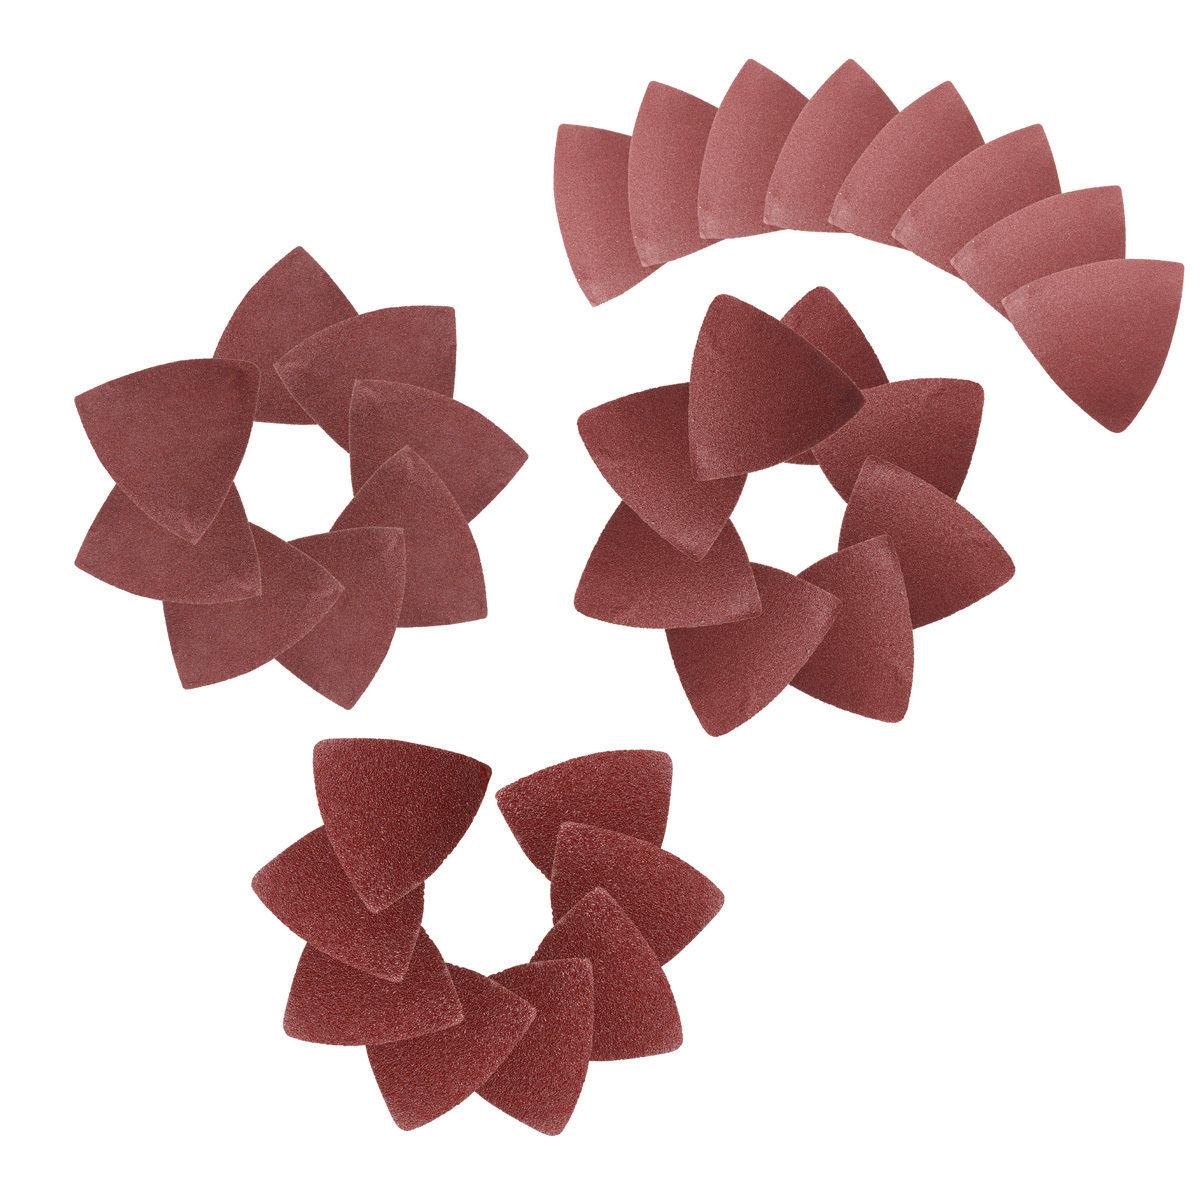 32Pcs 60/80/120/240 Grit Sanding Sheet Discs Triangle Grinder Sandpaper Pad 80mm